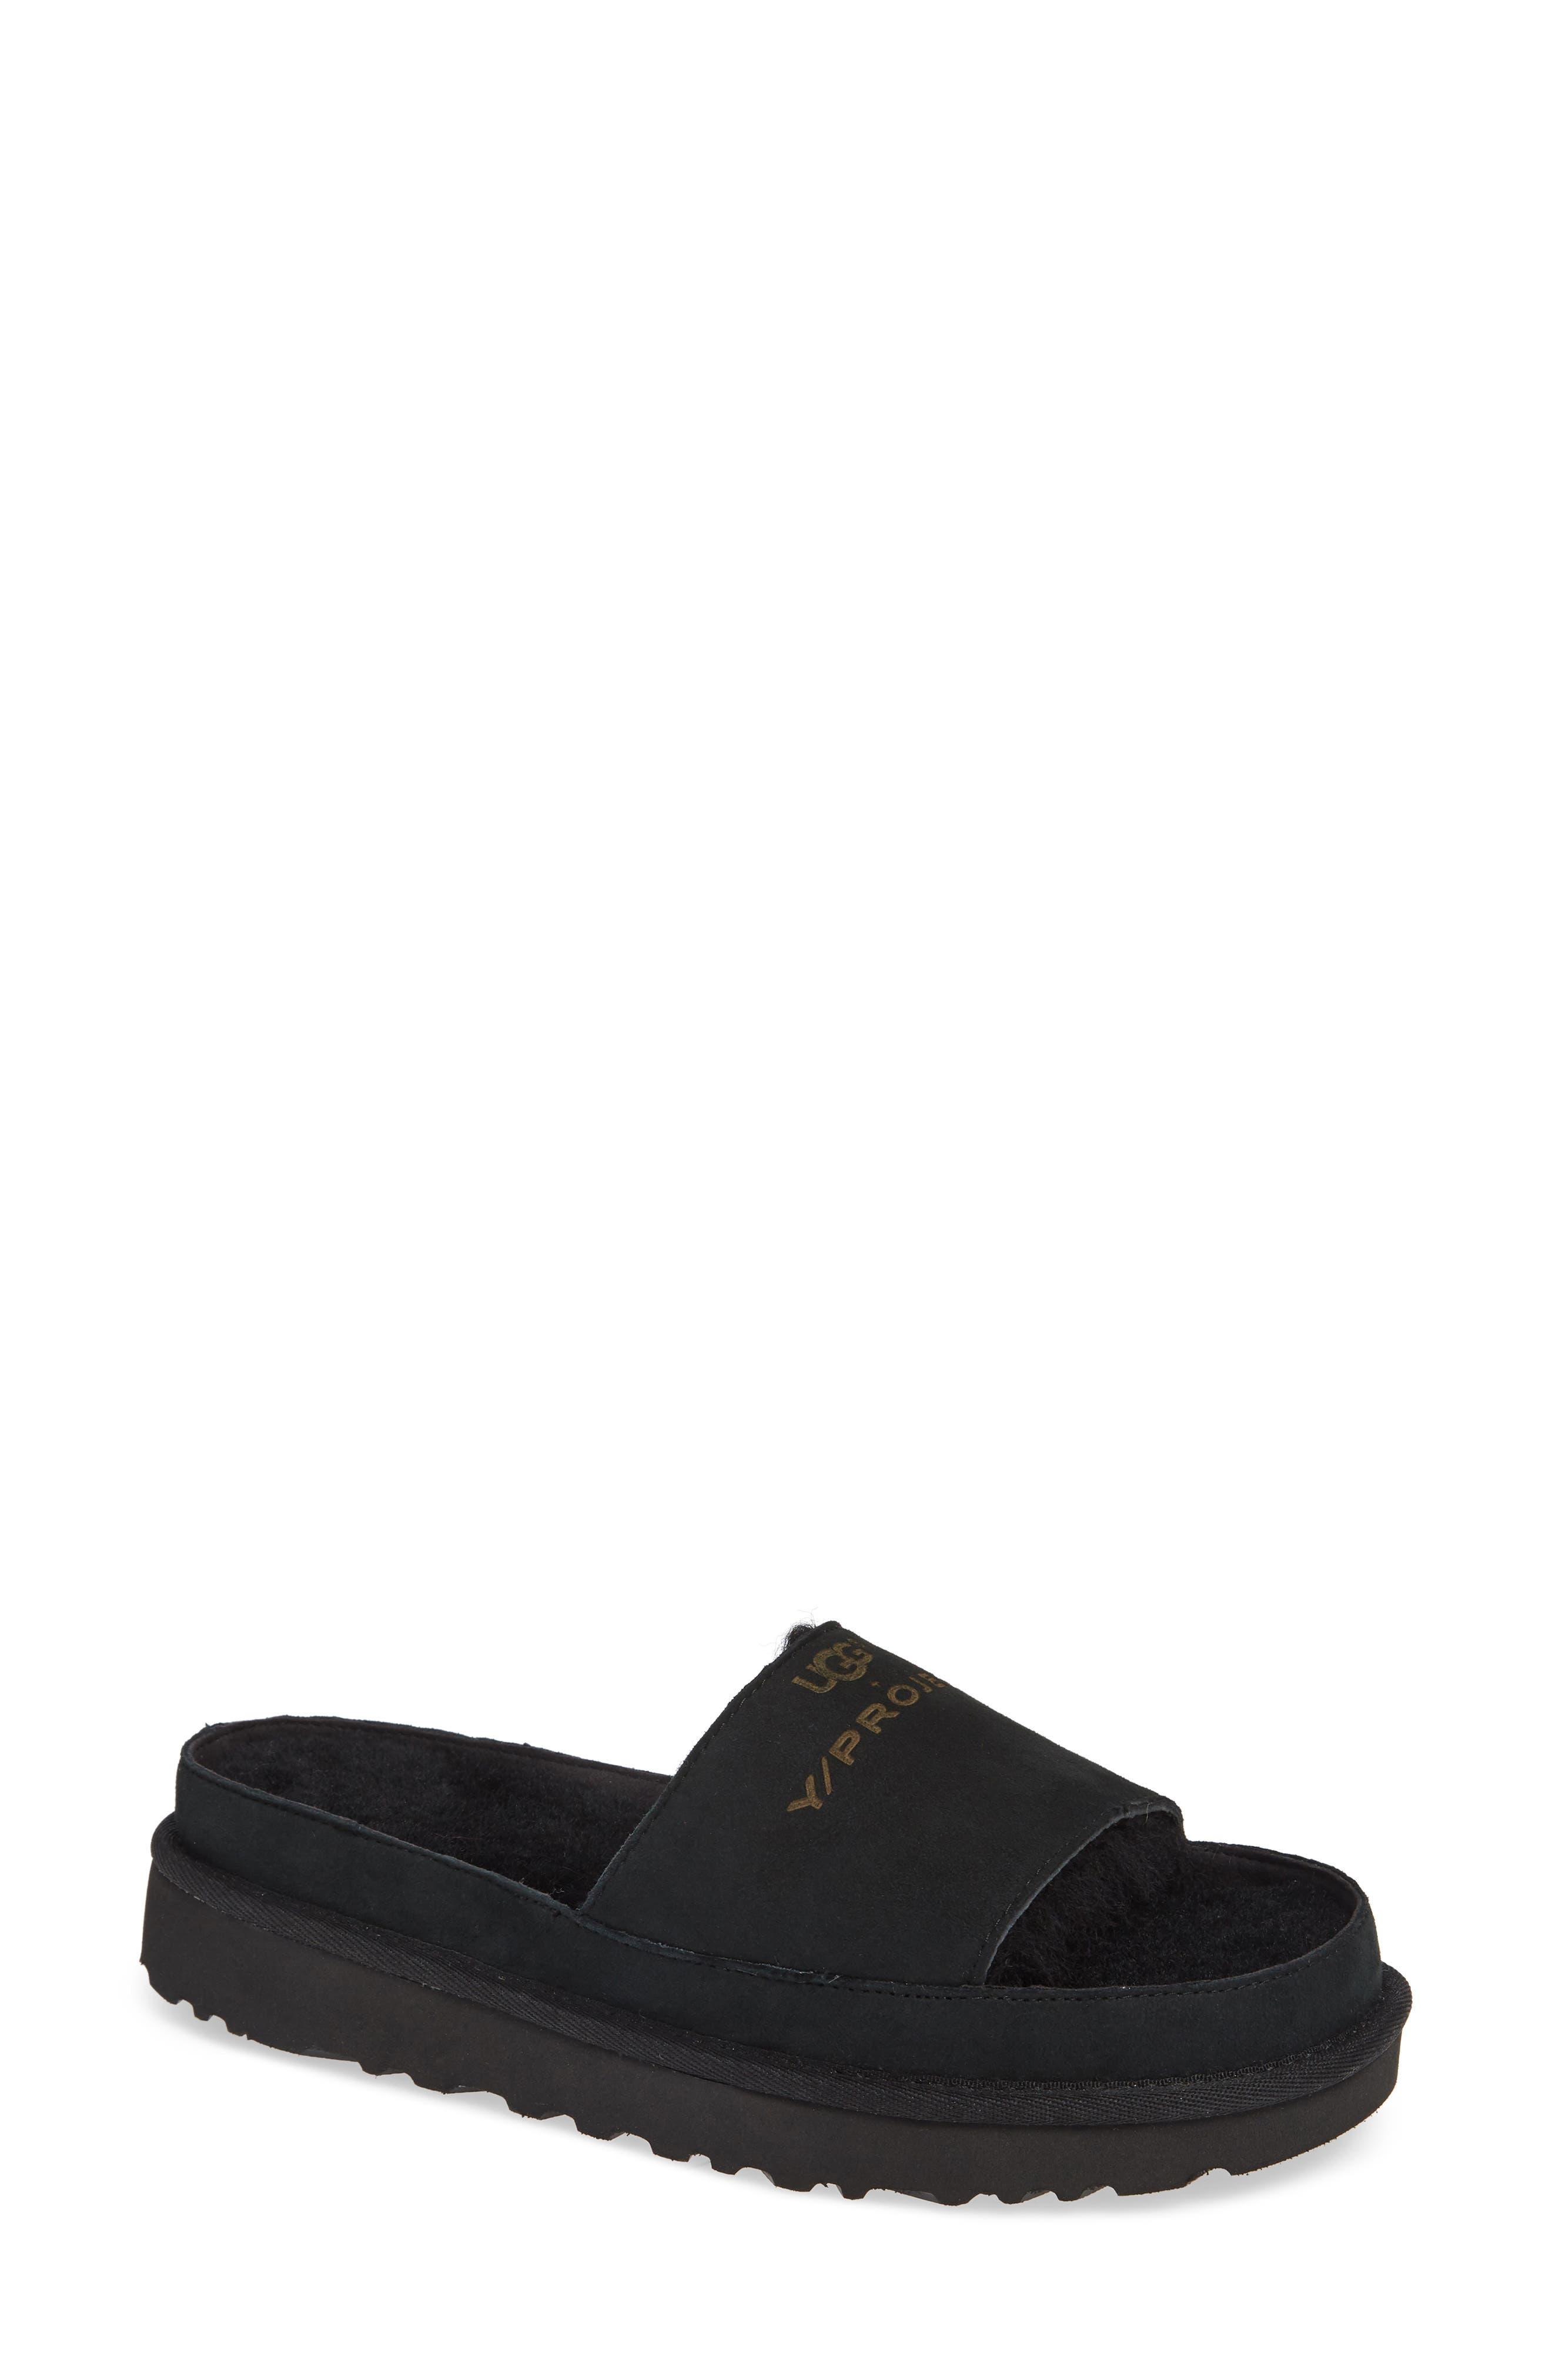 x UGG<sup>®</sup> Genuine Shearling Slide Sandal,                             Main thumbnail 1, color,                             001